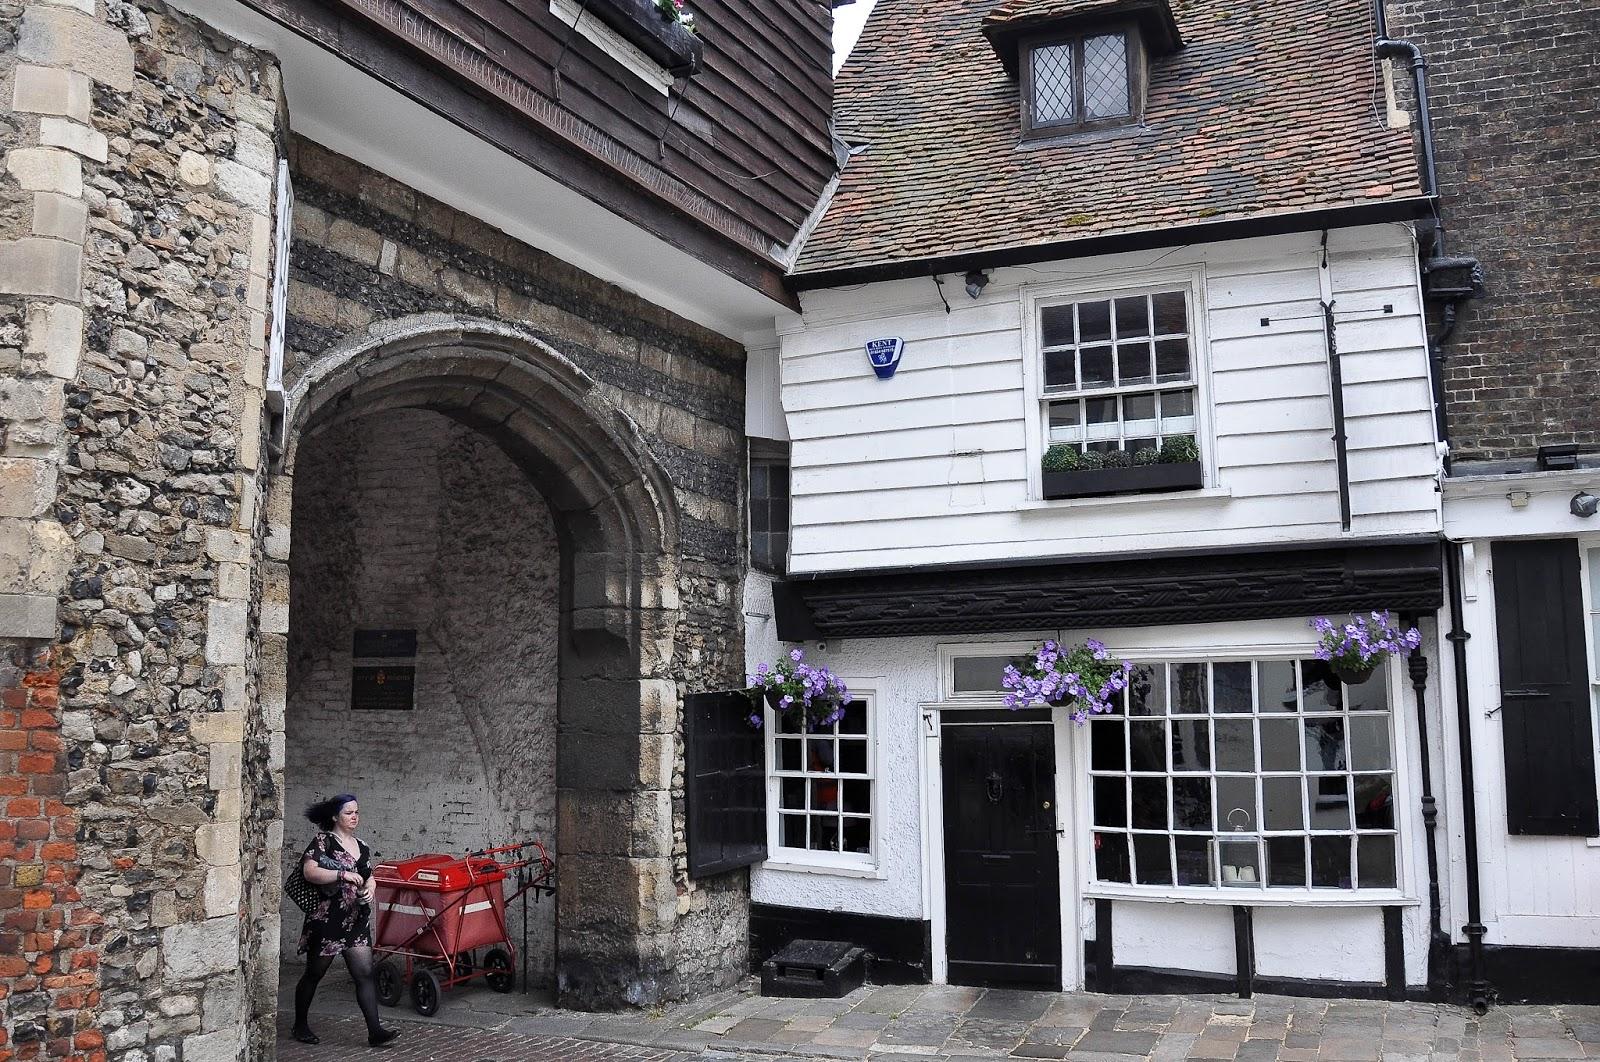 Quirky house, Rochester High Street, Kent, UK